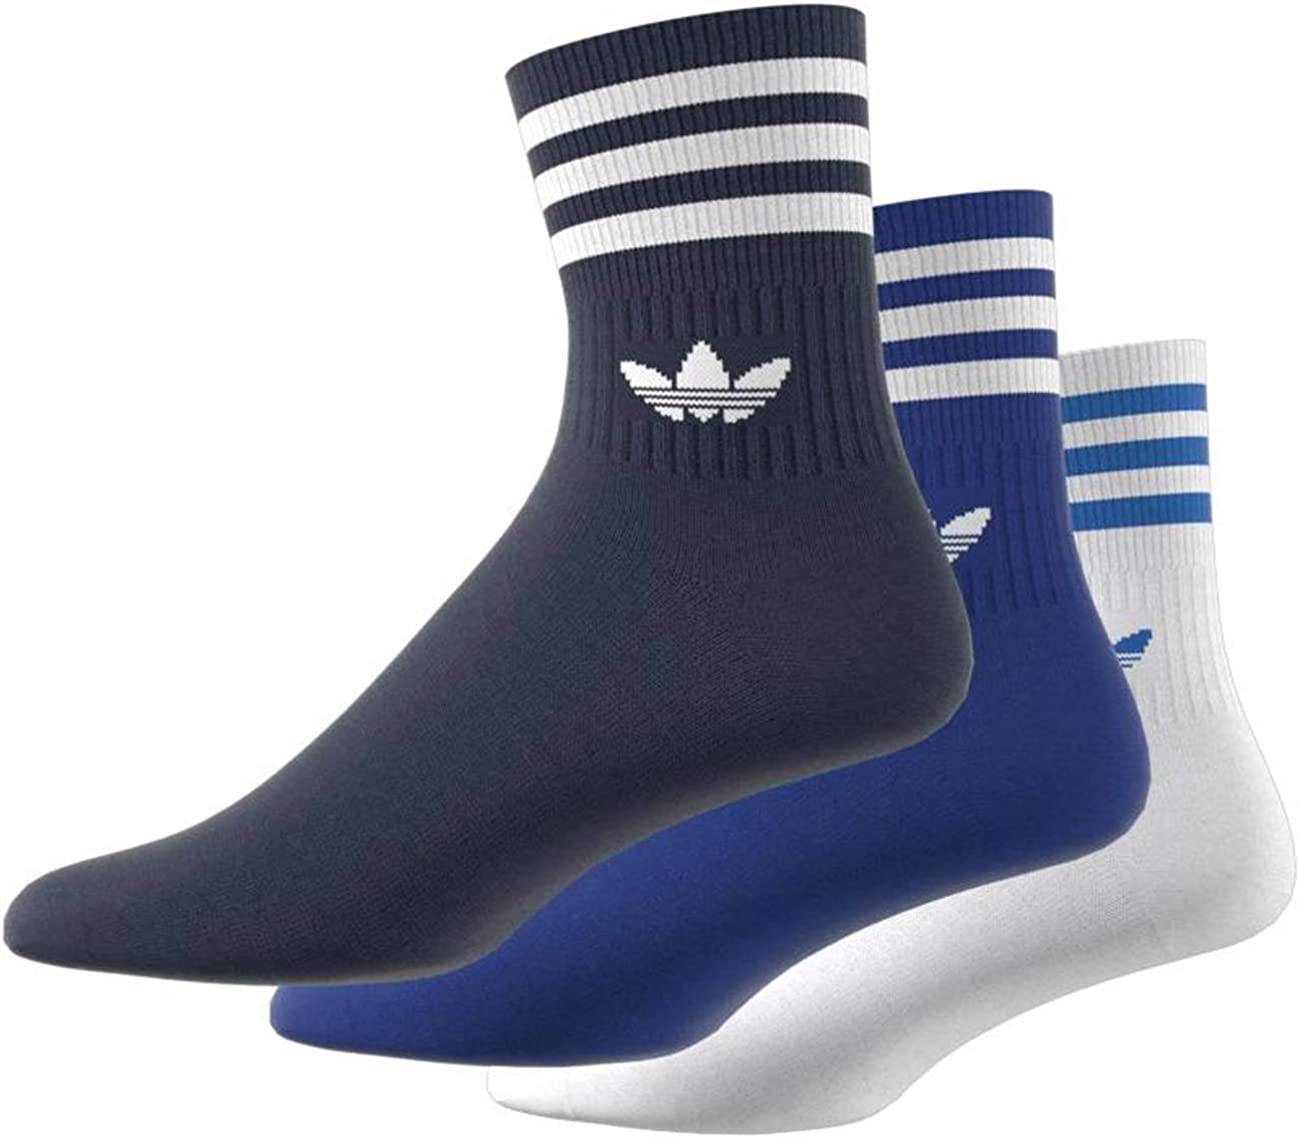 Chaussettes Adidas mi-mollet Mid-Cut x3